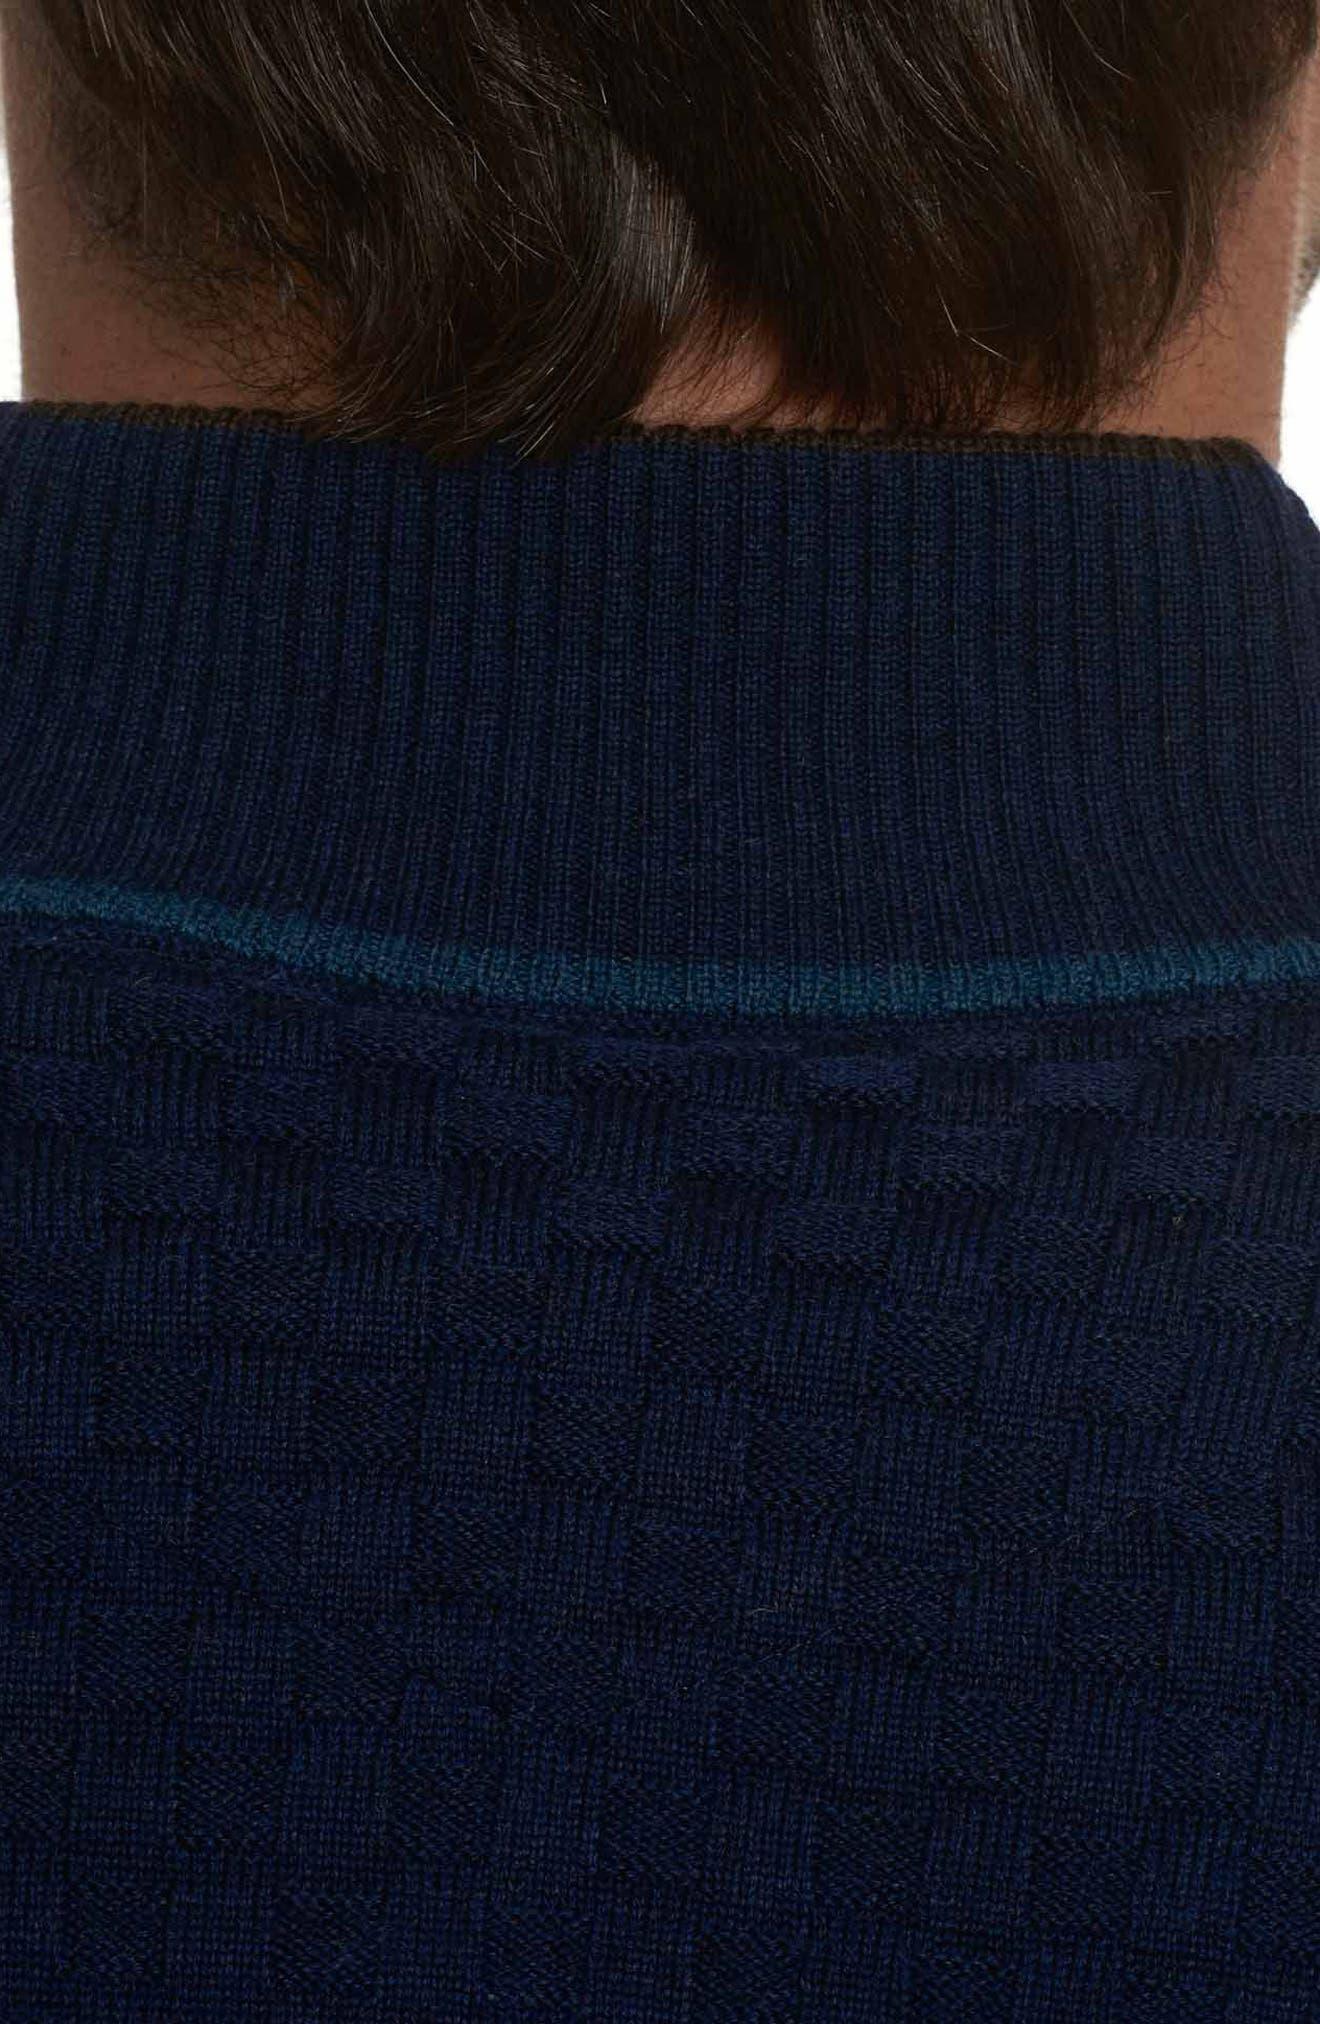 American Beech Wool Sweater,                             Alternate thumbnail 3, color,                             Navy